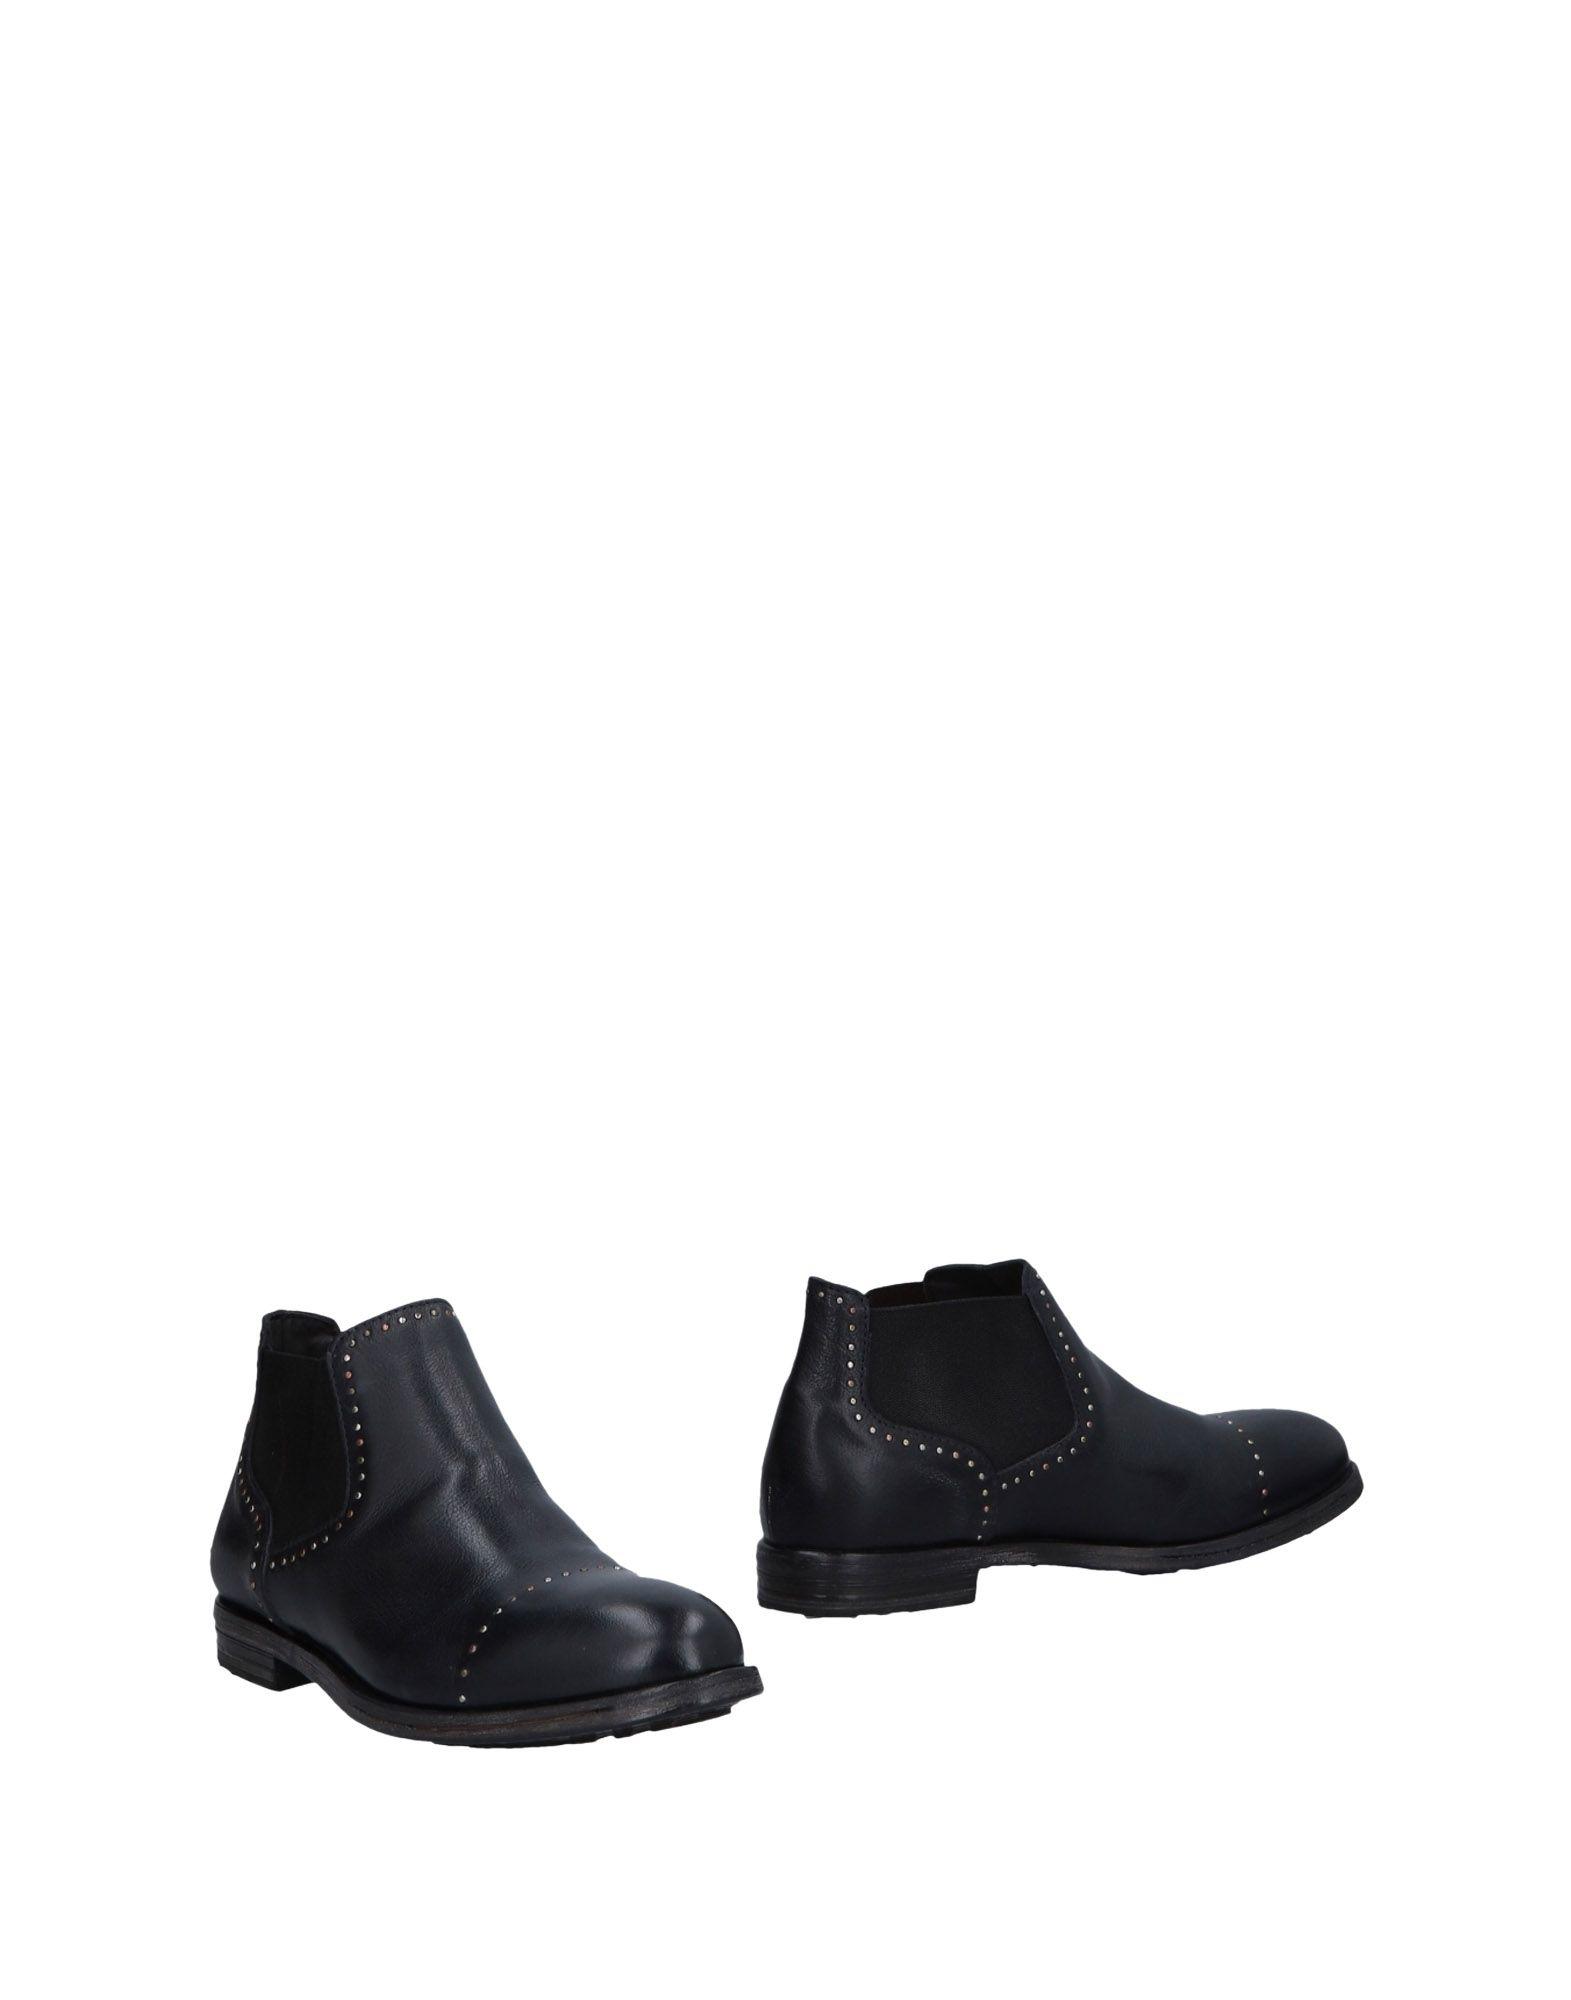 Moma Chelsea Boots Damen  11479301NJGut aussehende strapazierfähige Schuhe